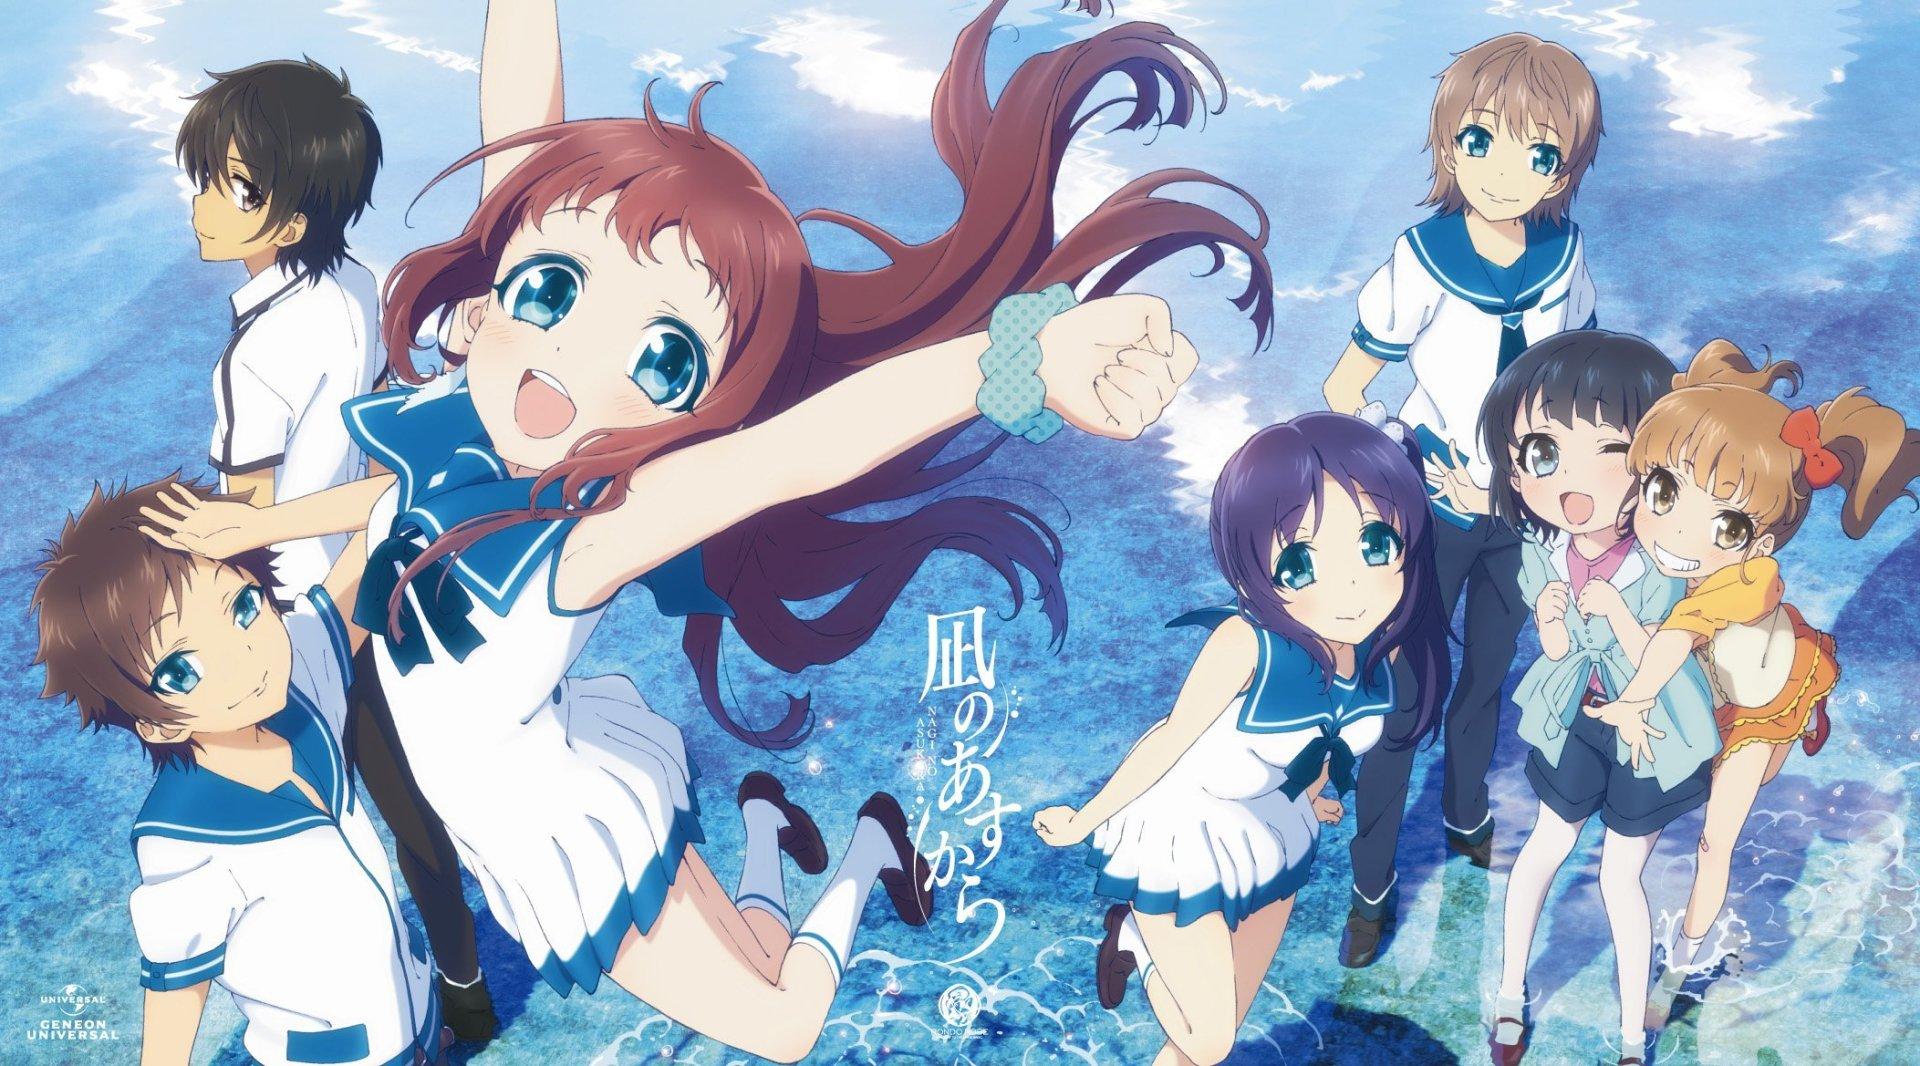 Review, Nagi-Asu, Nagi No Asukara, A Lull in the Sea, Anime, Merfolk, Merman, Mermaid, Little Mermaid, Love Between Merfolk and Human, Shoujo, Romance, Fantasy, Kawaii, Cute, Animation